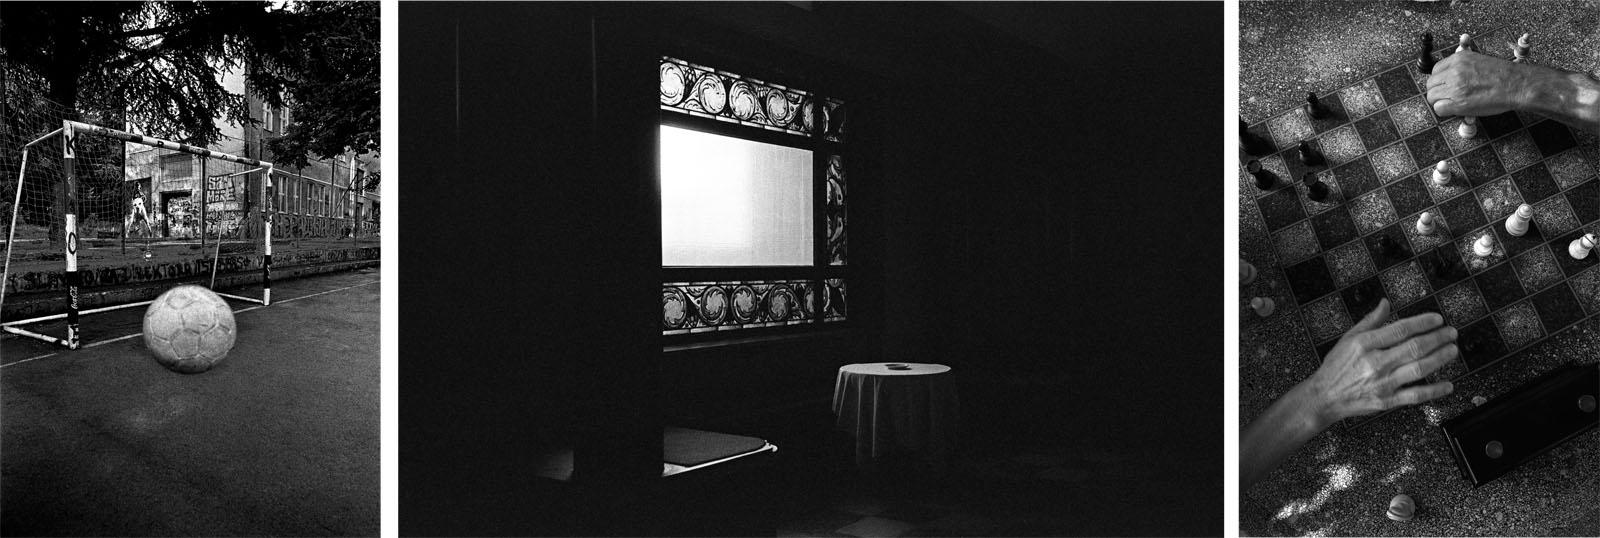 Art and Documentary Photography - Loading BGD___Fabio_Sgroi_03.jpg